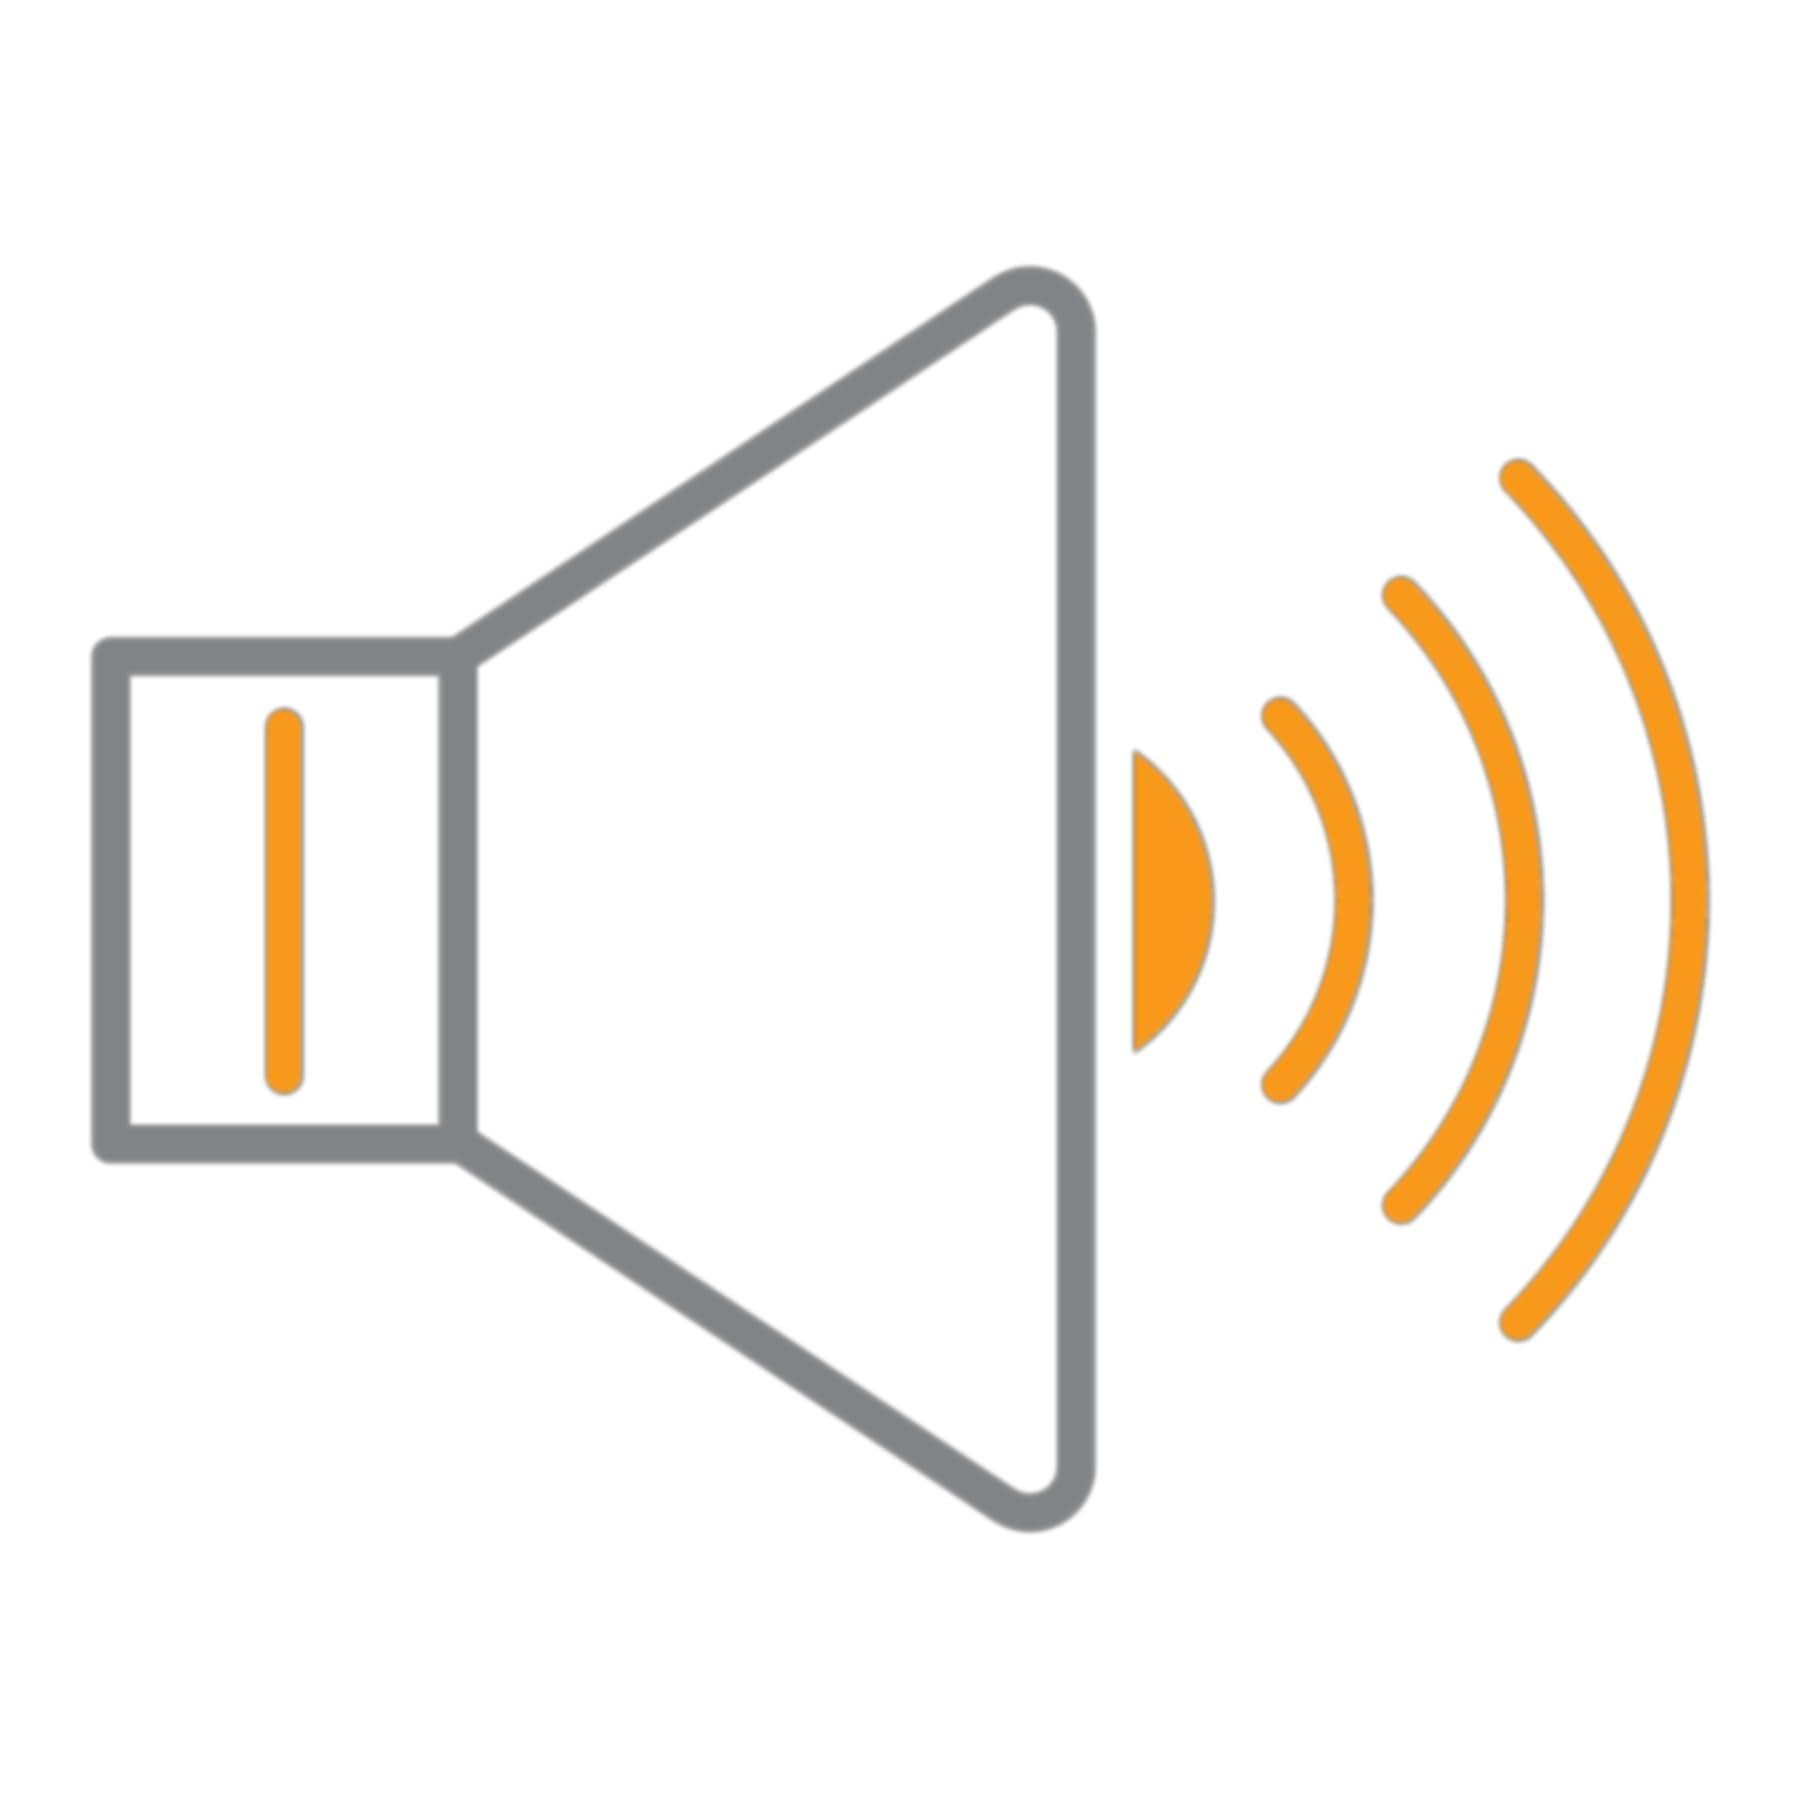 Speaker streaming audio